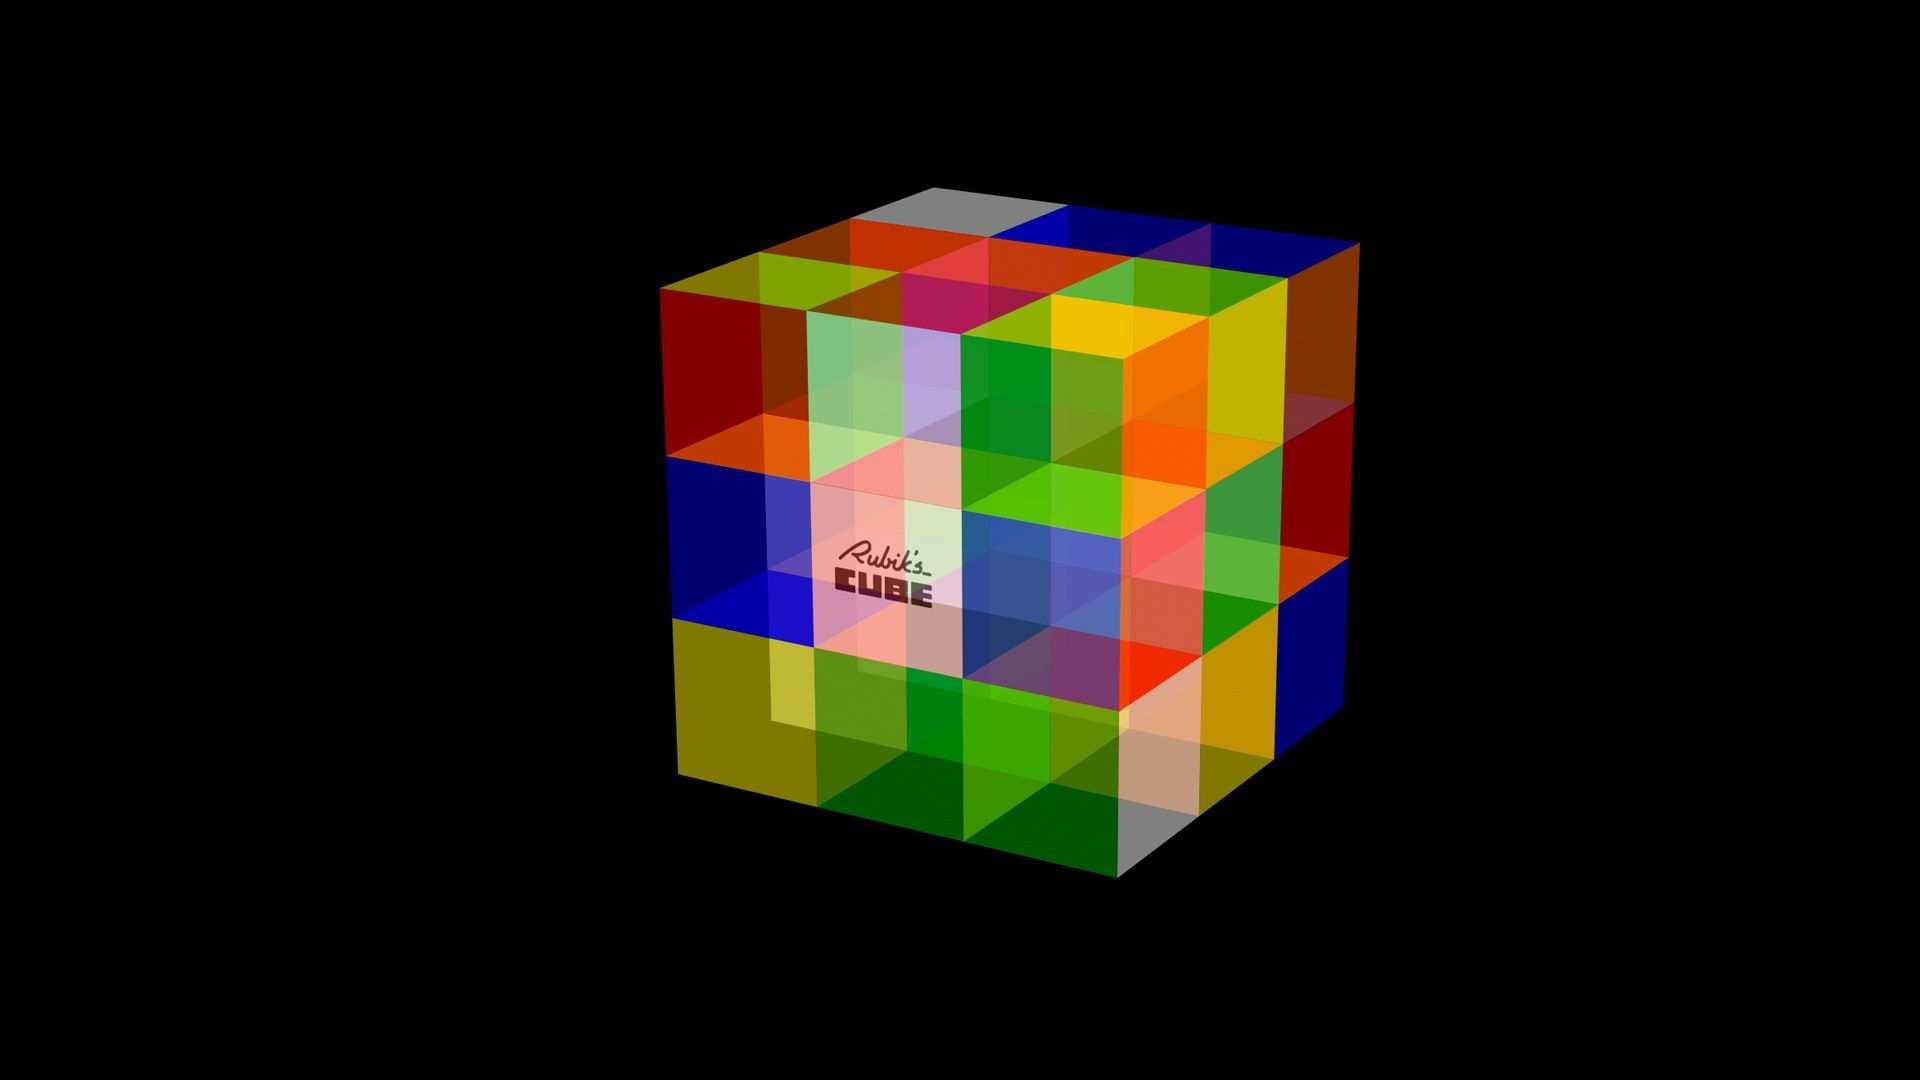 D Rubiks Cube Wallpaper Cube Desktop Wallpaper Free Hd Desktop Cube Rubiks Cube Abstract Wallpaper